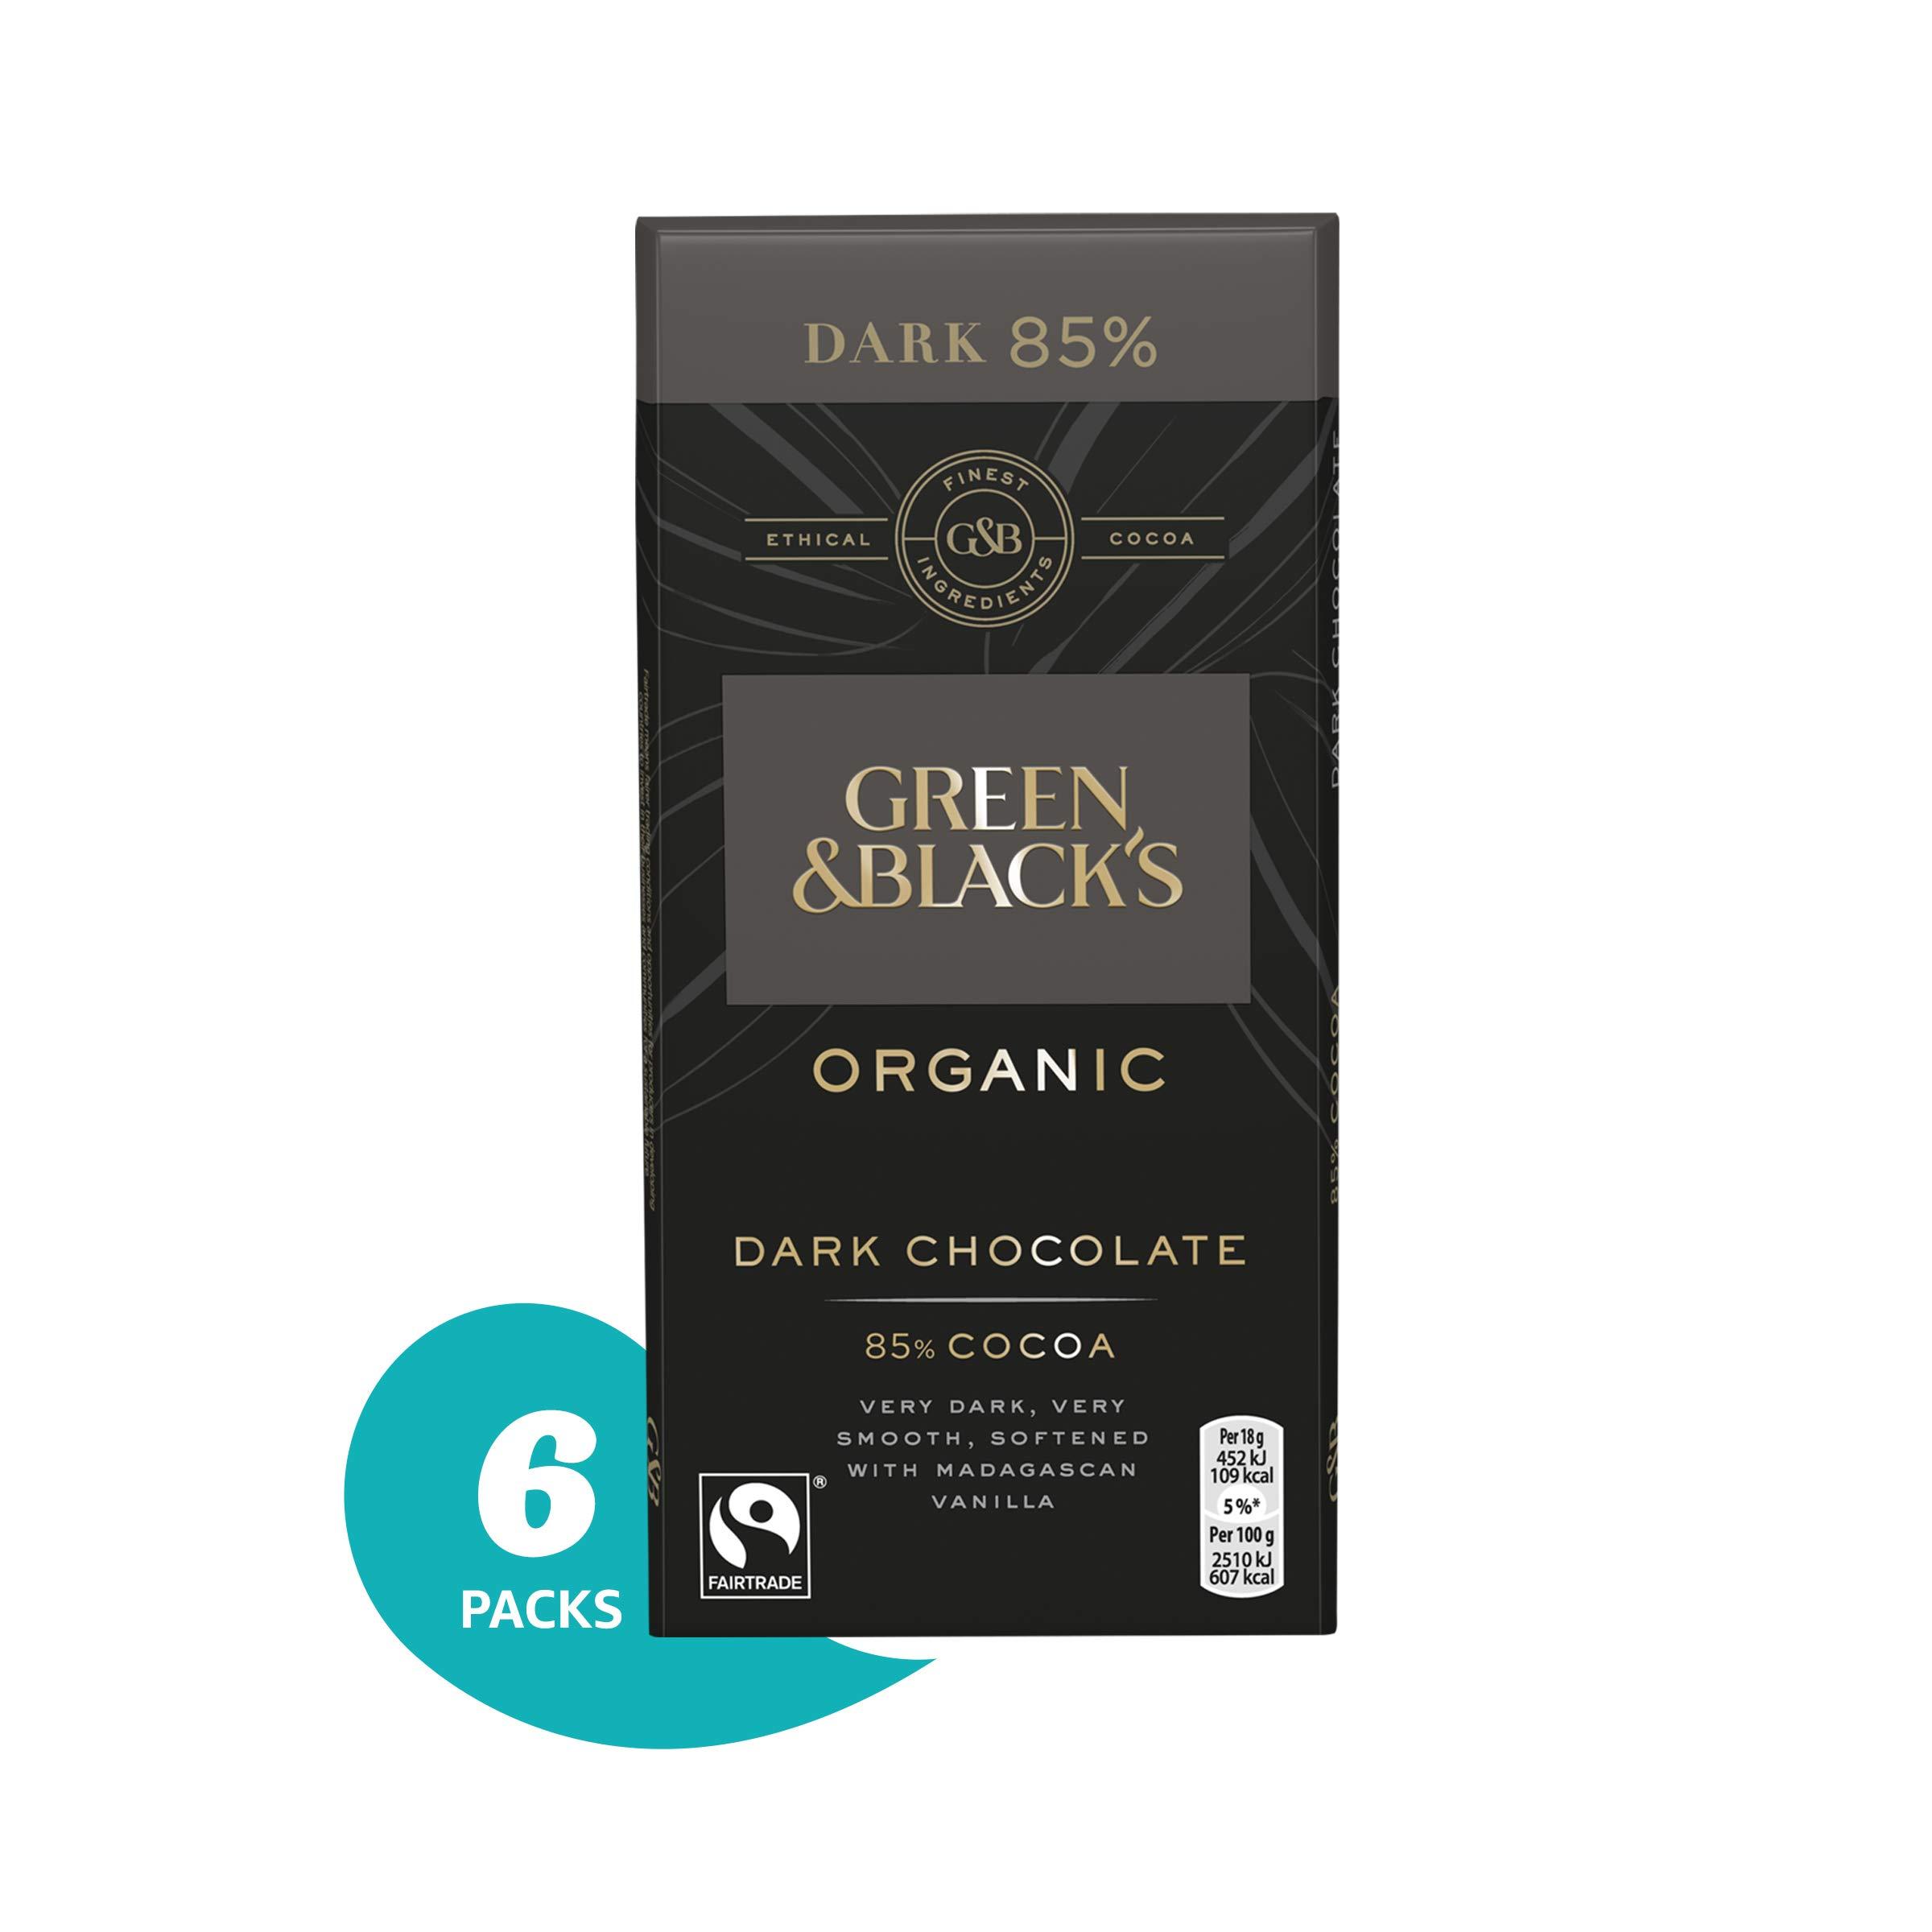 Green & Black's Organic 85% Dark Chocolate Candy Bars, 6 Count